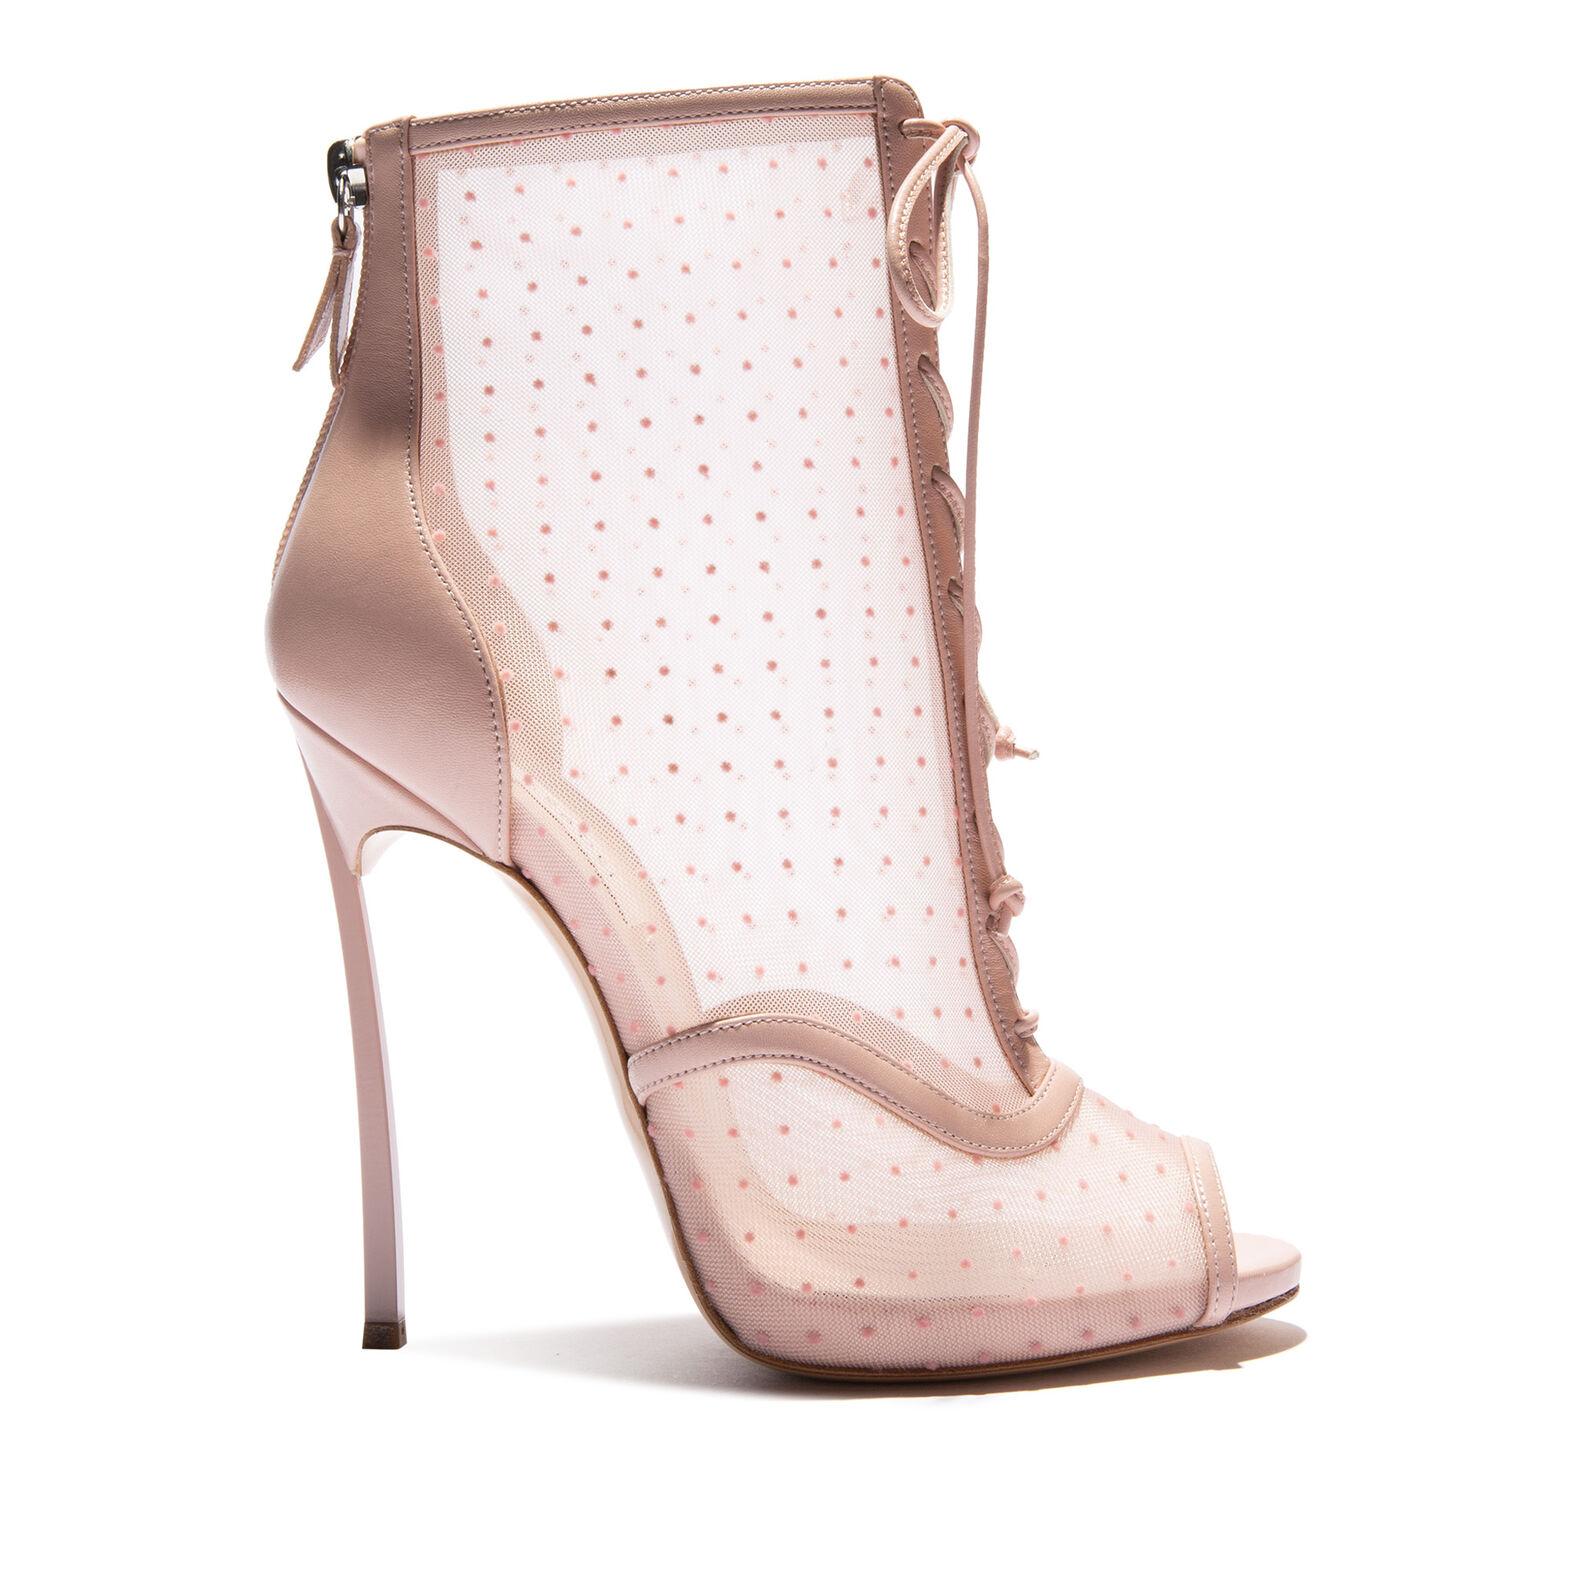 Women S Farbpalette Hw20 In Plastic Pink Blade Folies Bergere Casadei